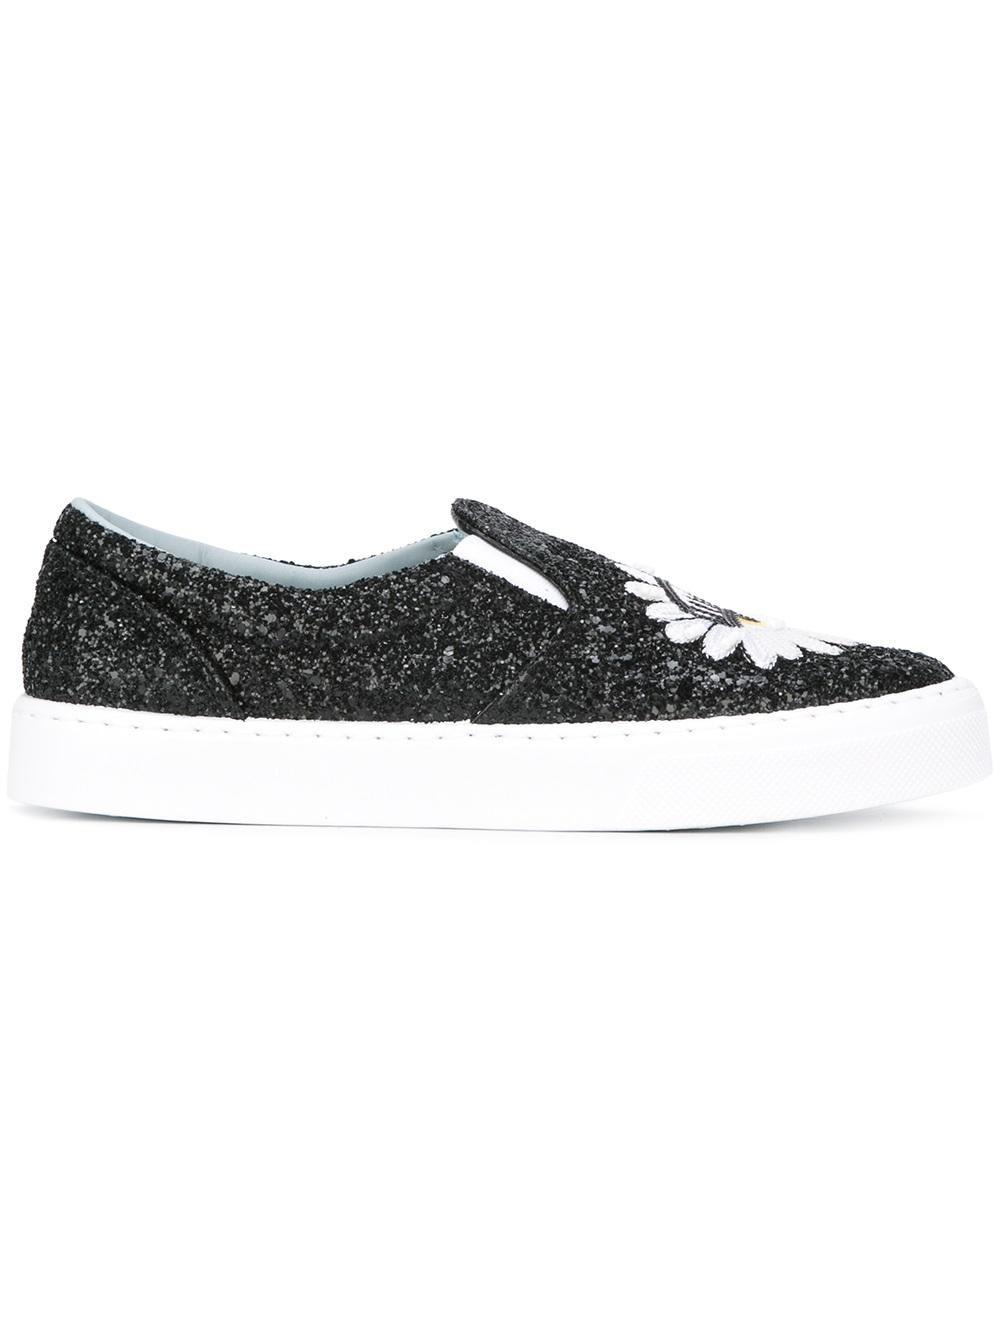 Chiara Ferragni Black Leather Slip On Sneakers